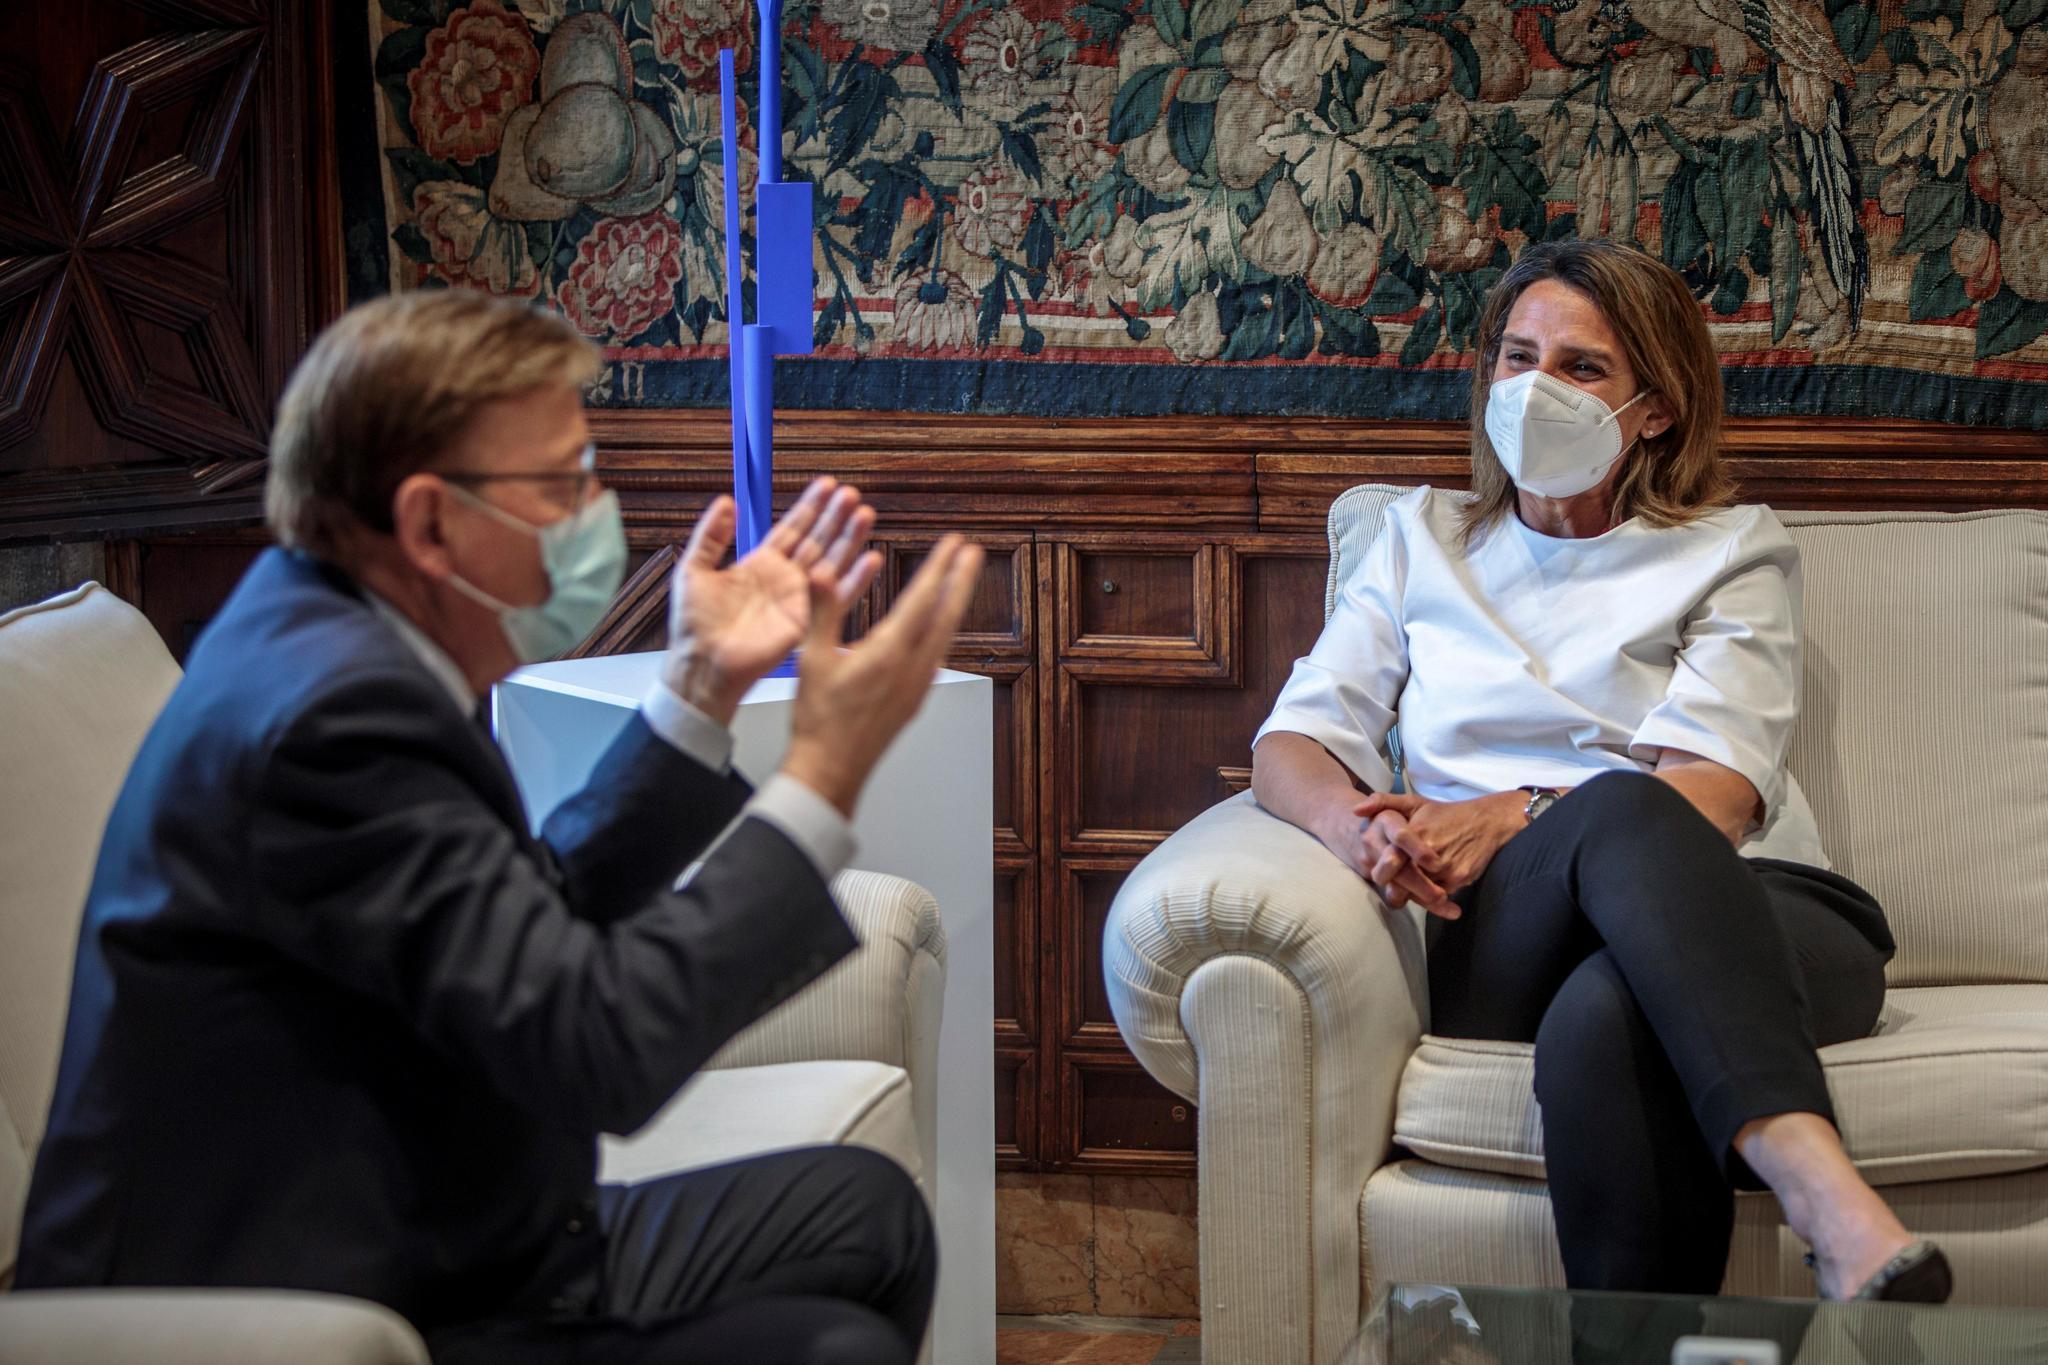 La ministra de Transición Ecológica, Teresa Ribera, escucha al presidente de la Generalitat, Ximo Puig.